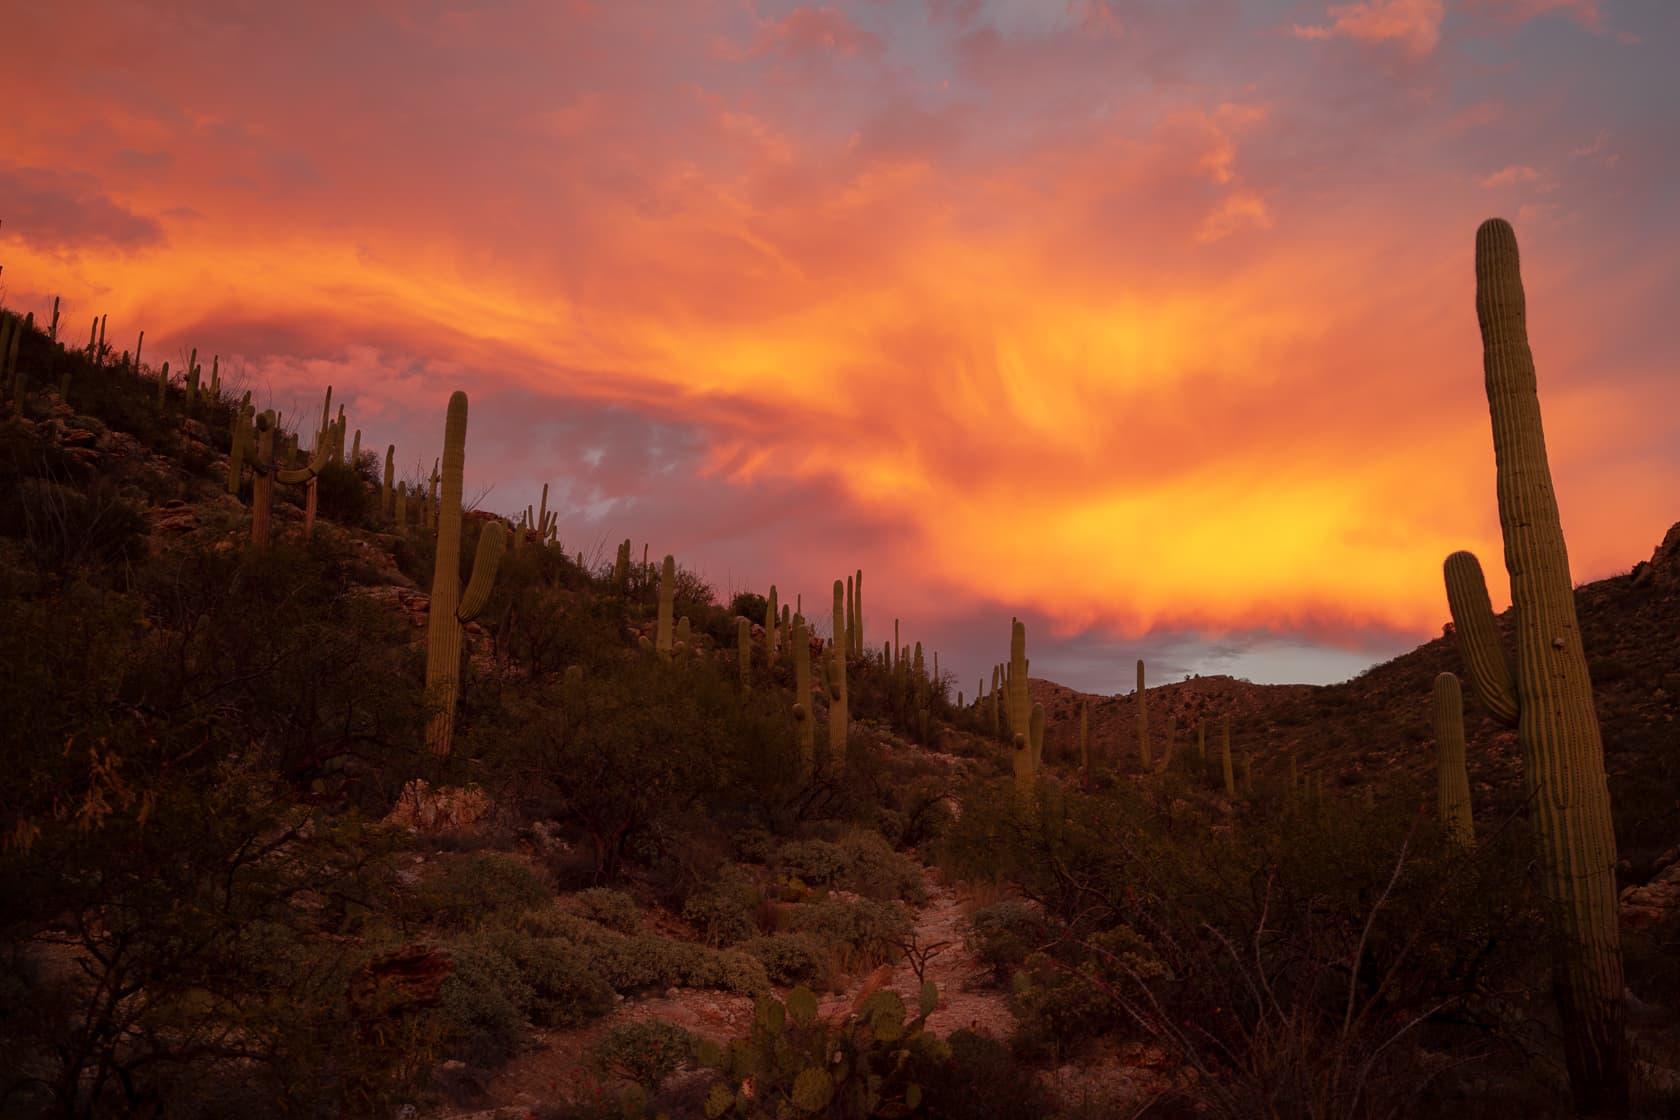 Sunset on Agua Caliente Hill